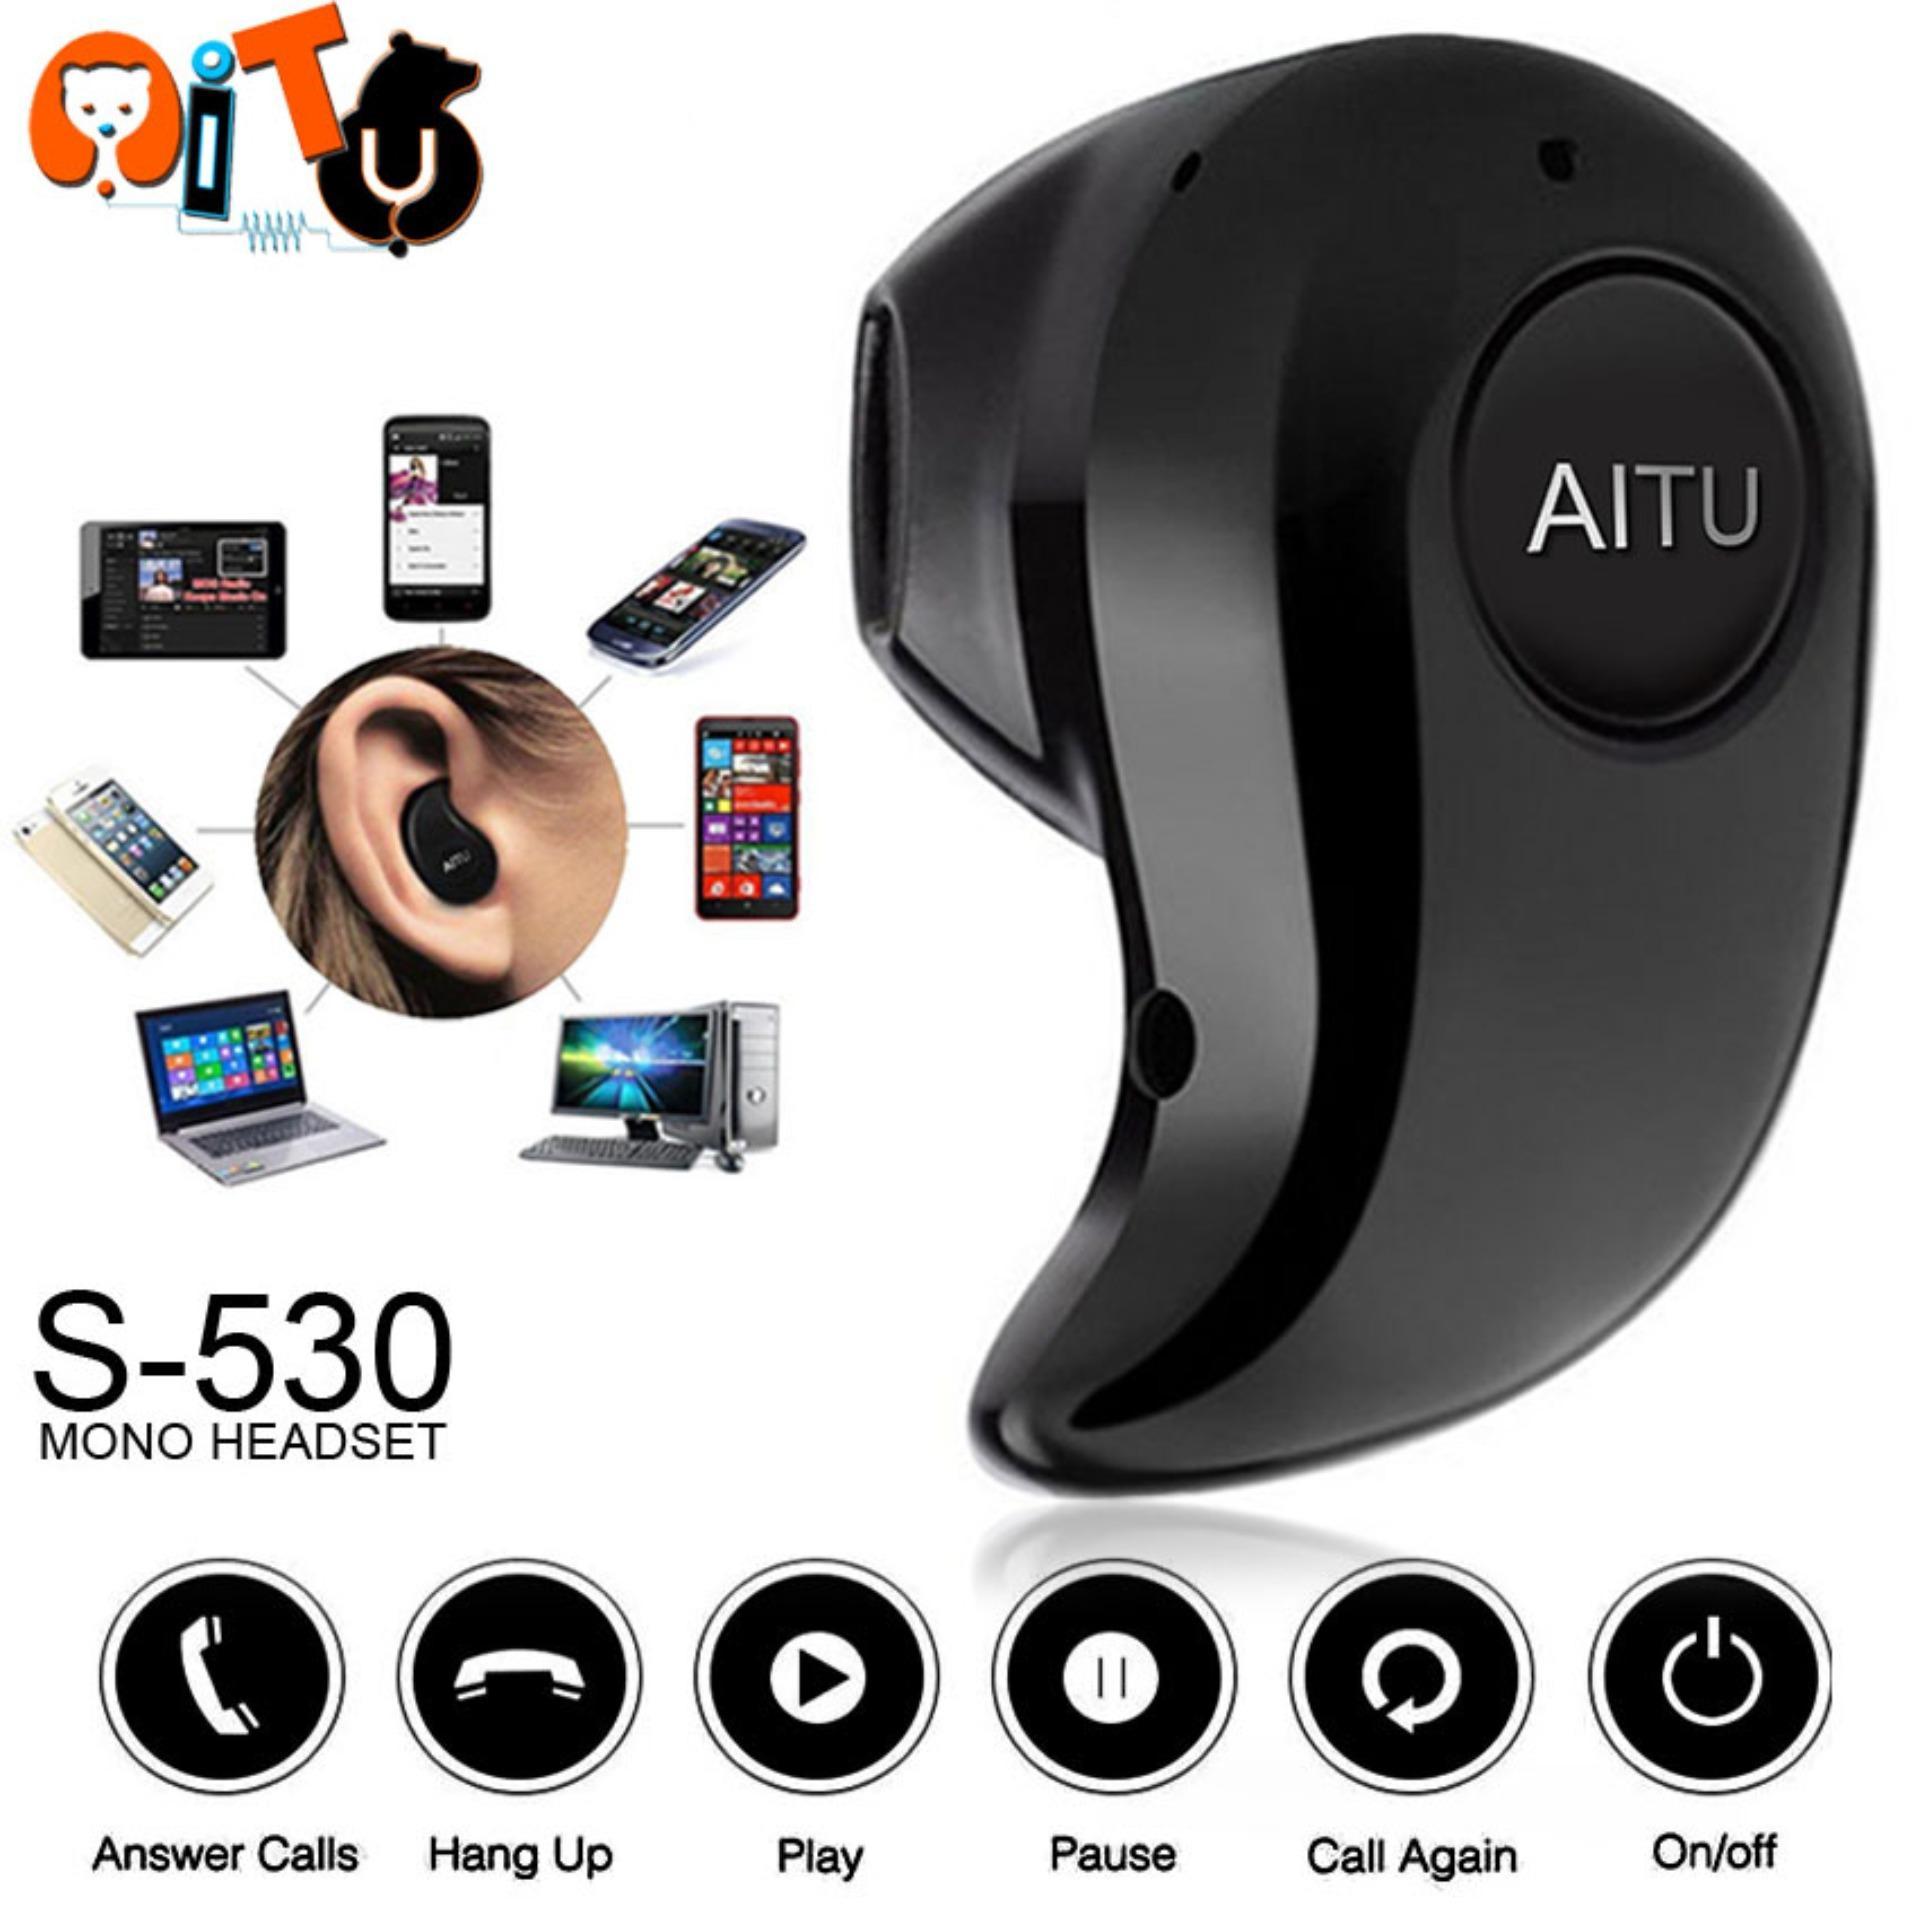 Headphones for sale - Bluetooth Headphones prices, brands